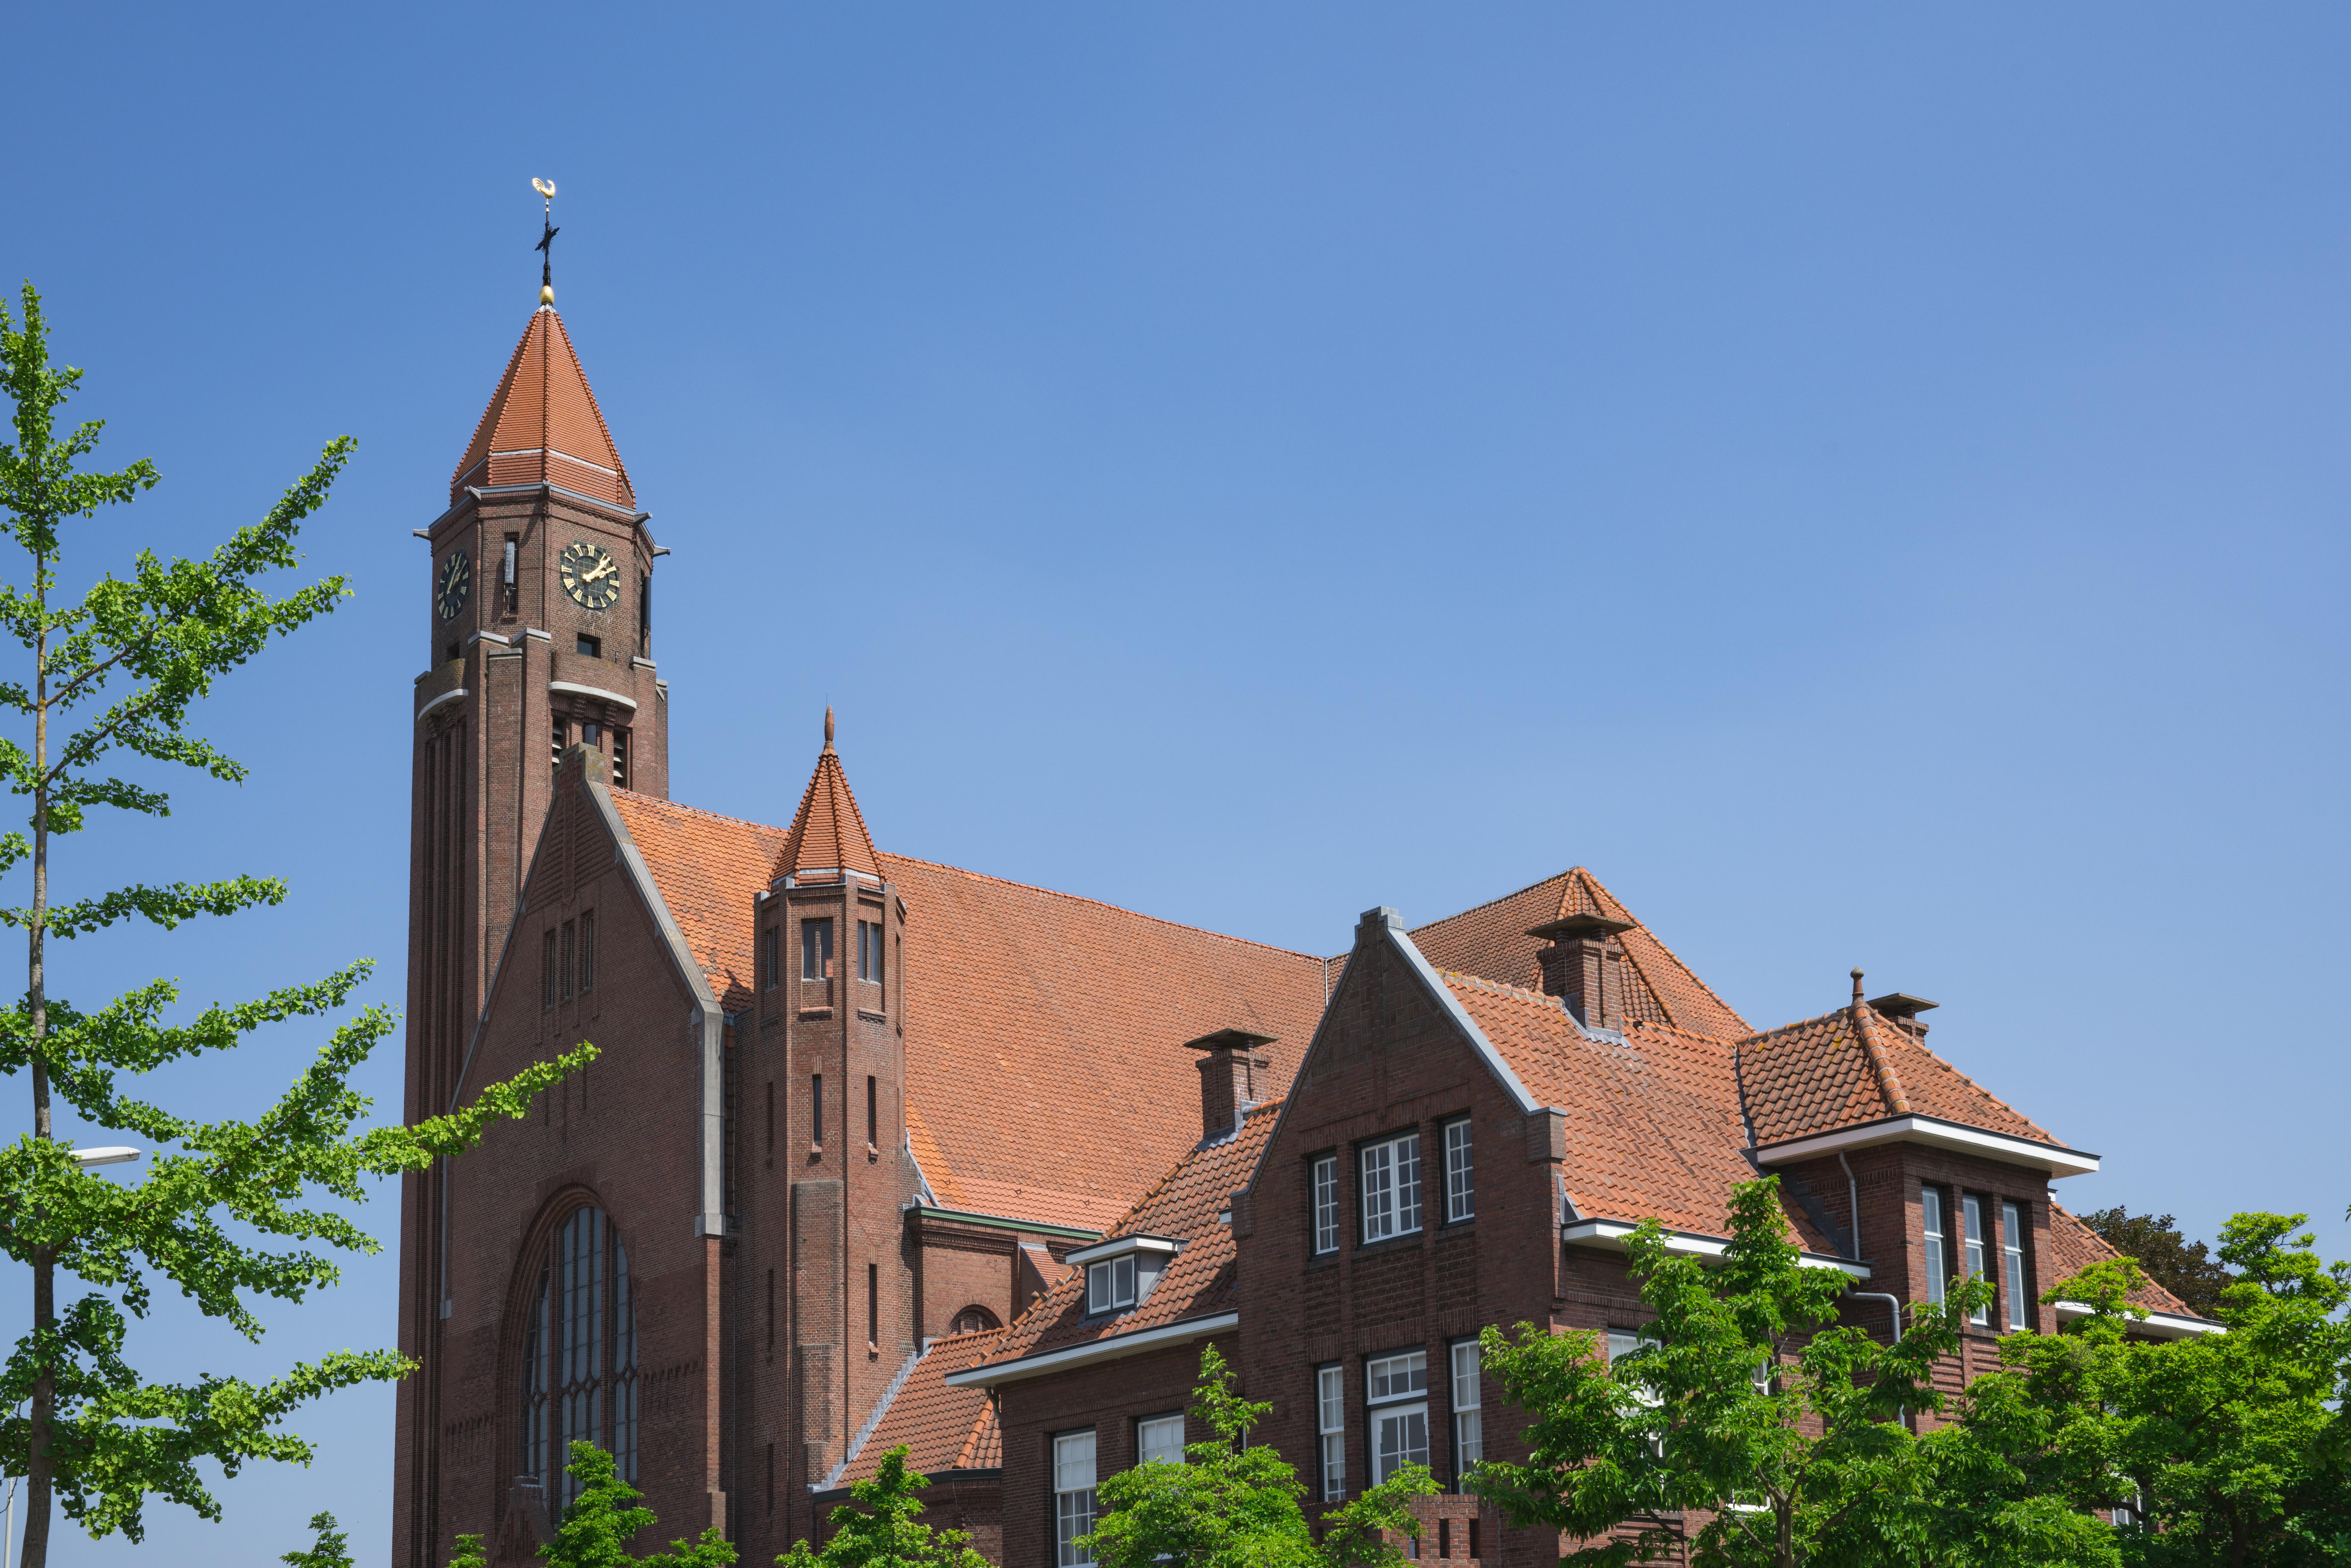 H. Joseph kerk Roosendaal, The Netherlands